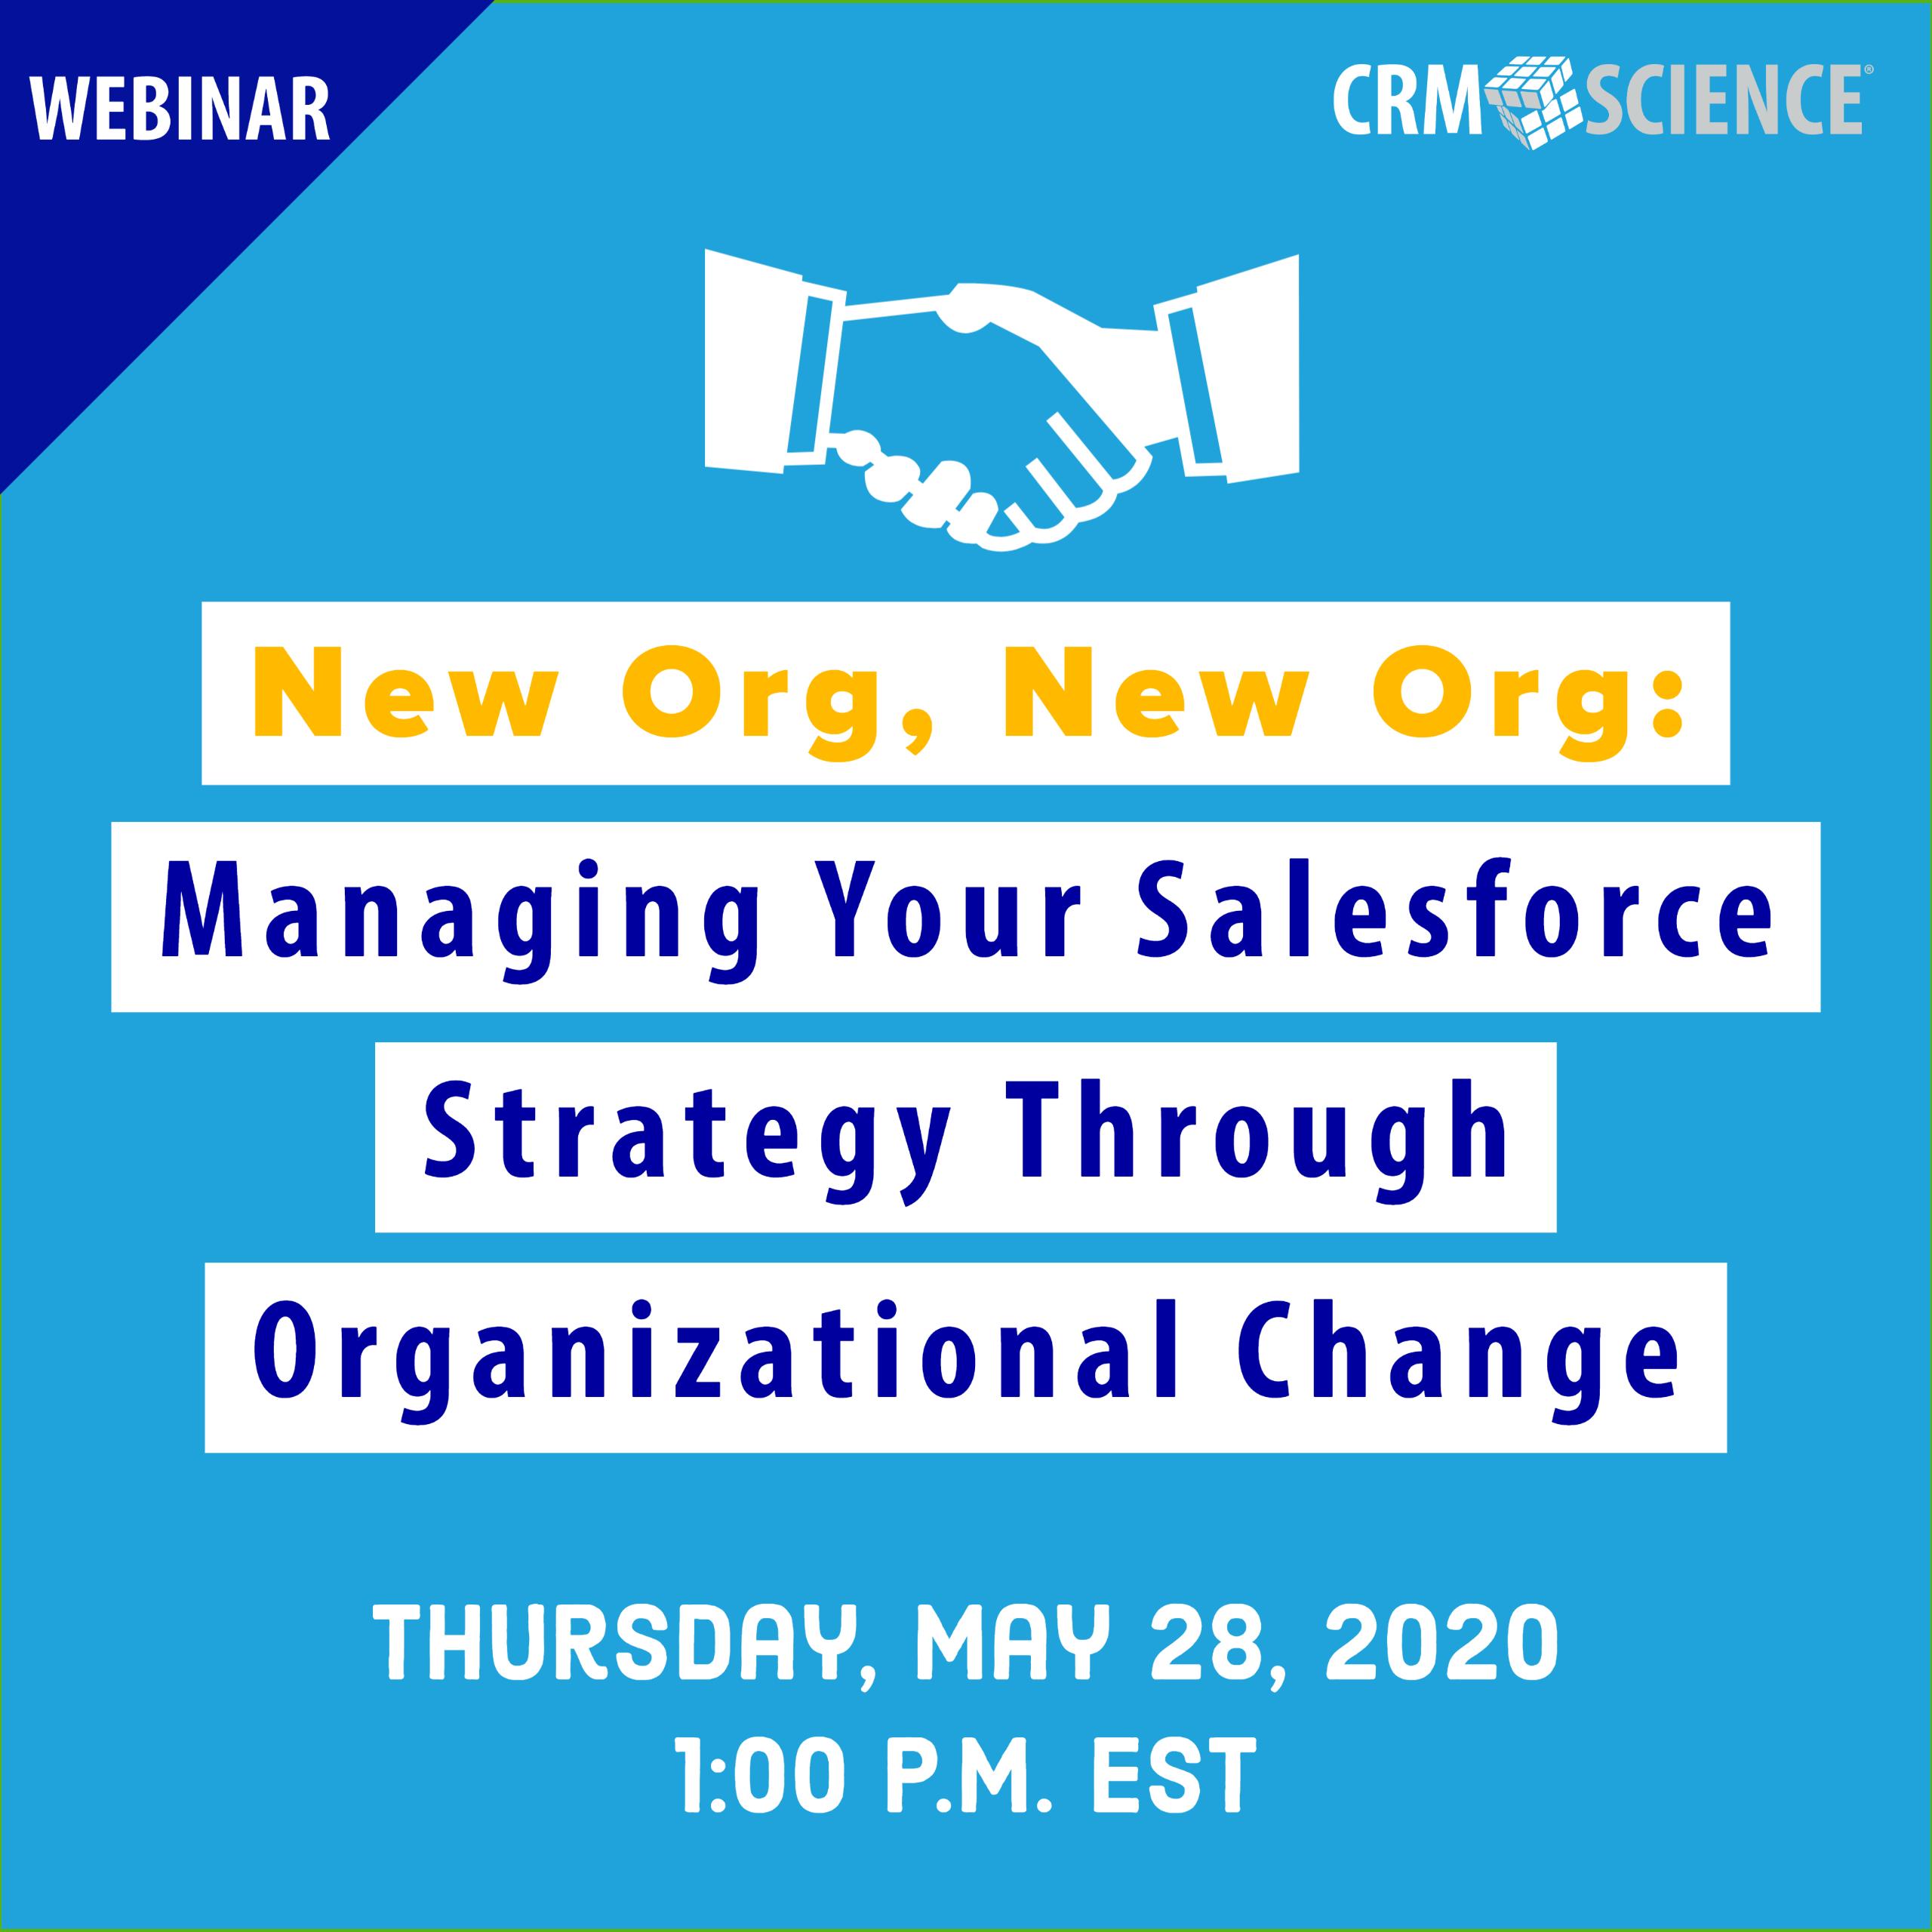 Webinar: Organizational Change